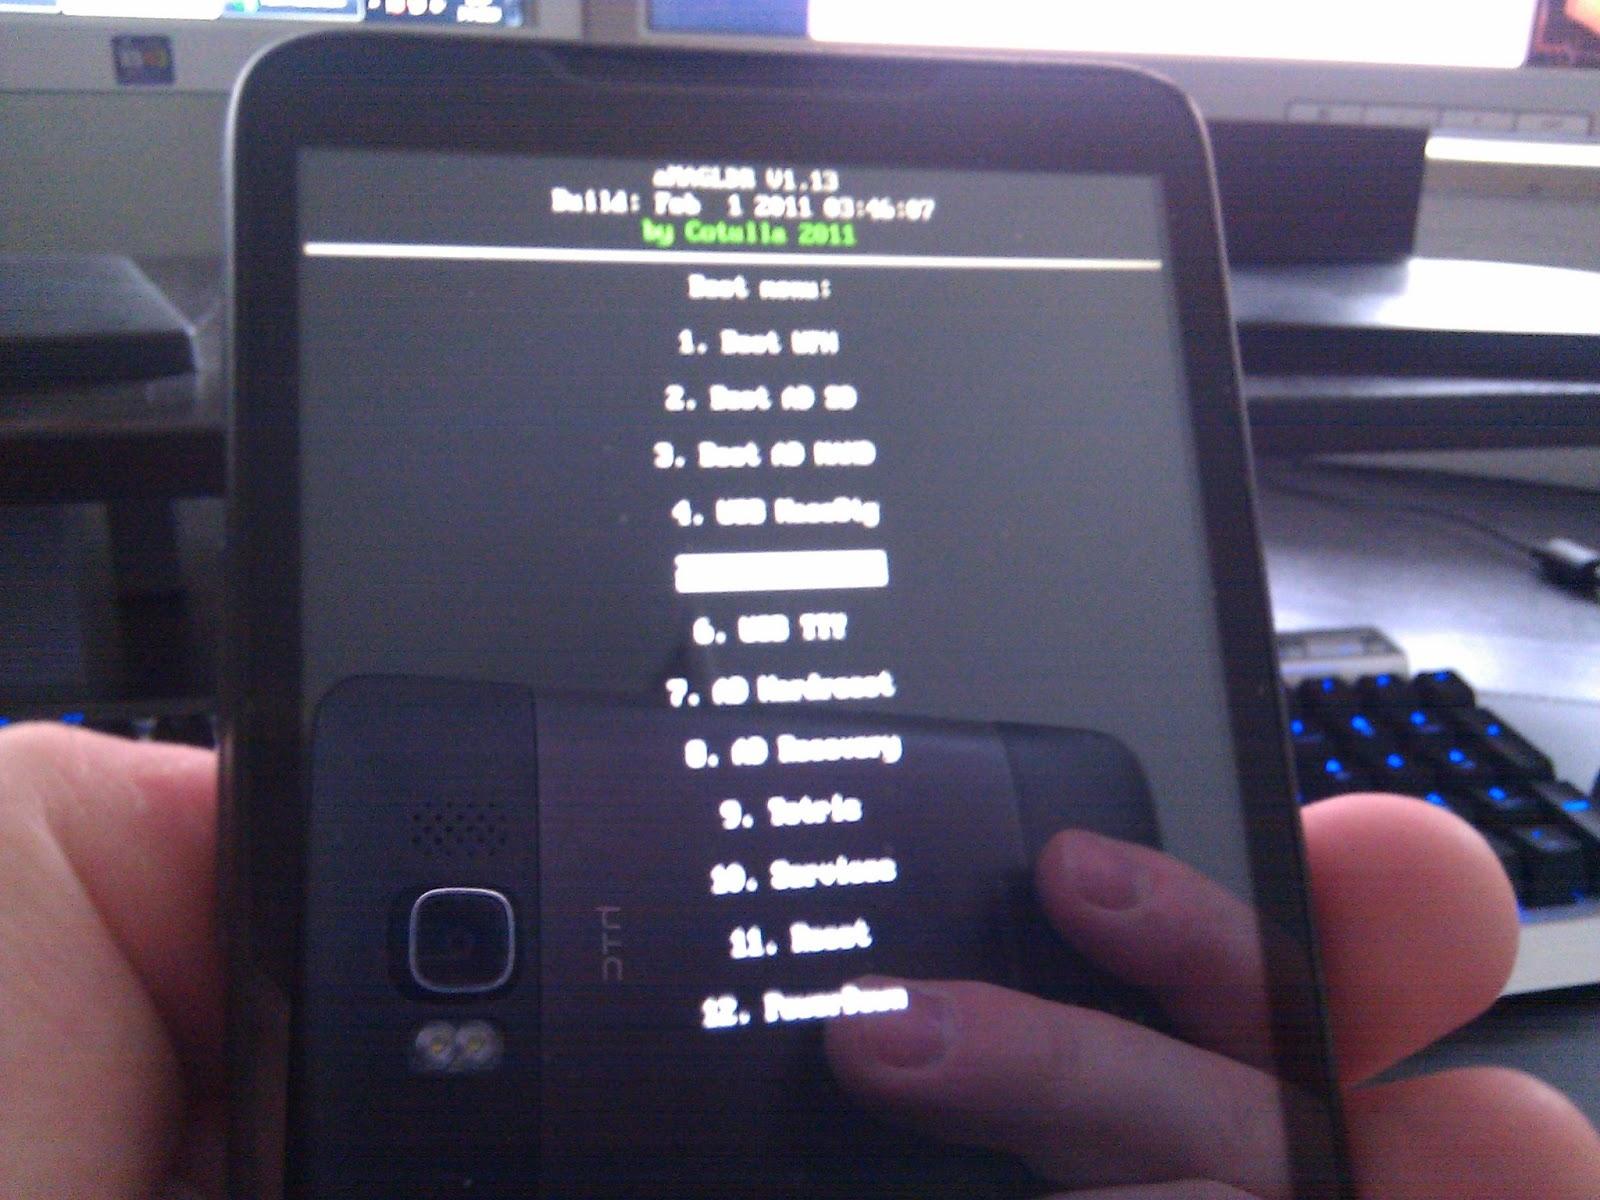 htc hd2 t8585 rom upgrade download